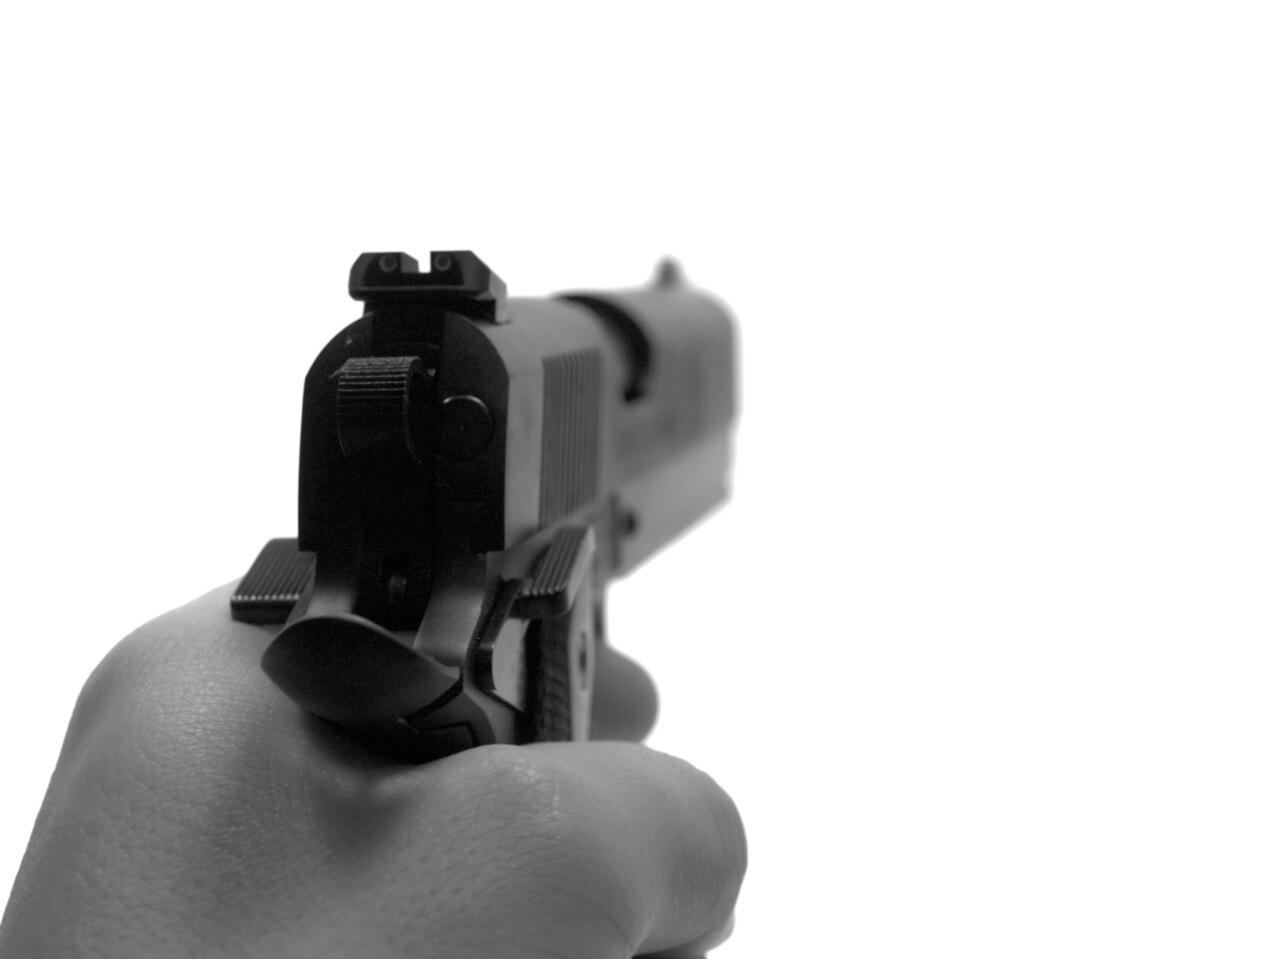 arme a feu chez sois